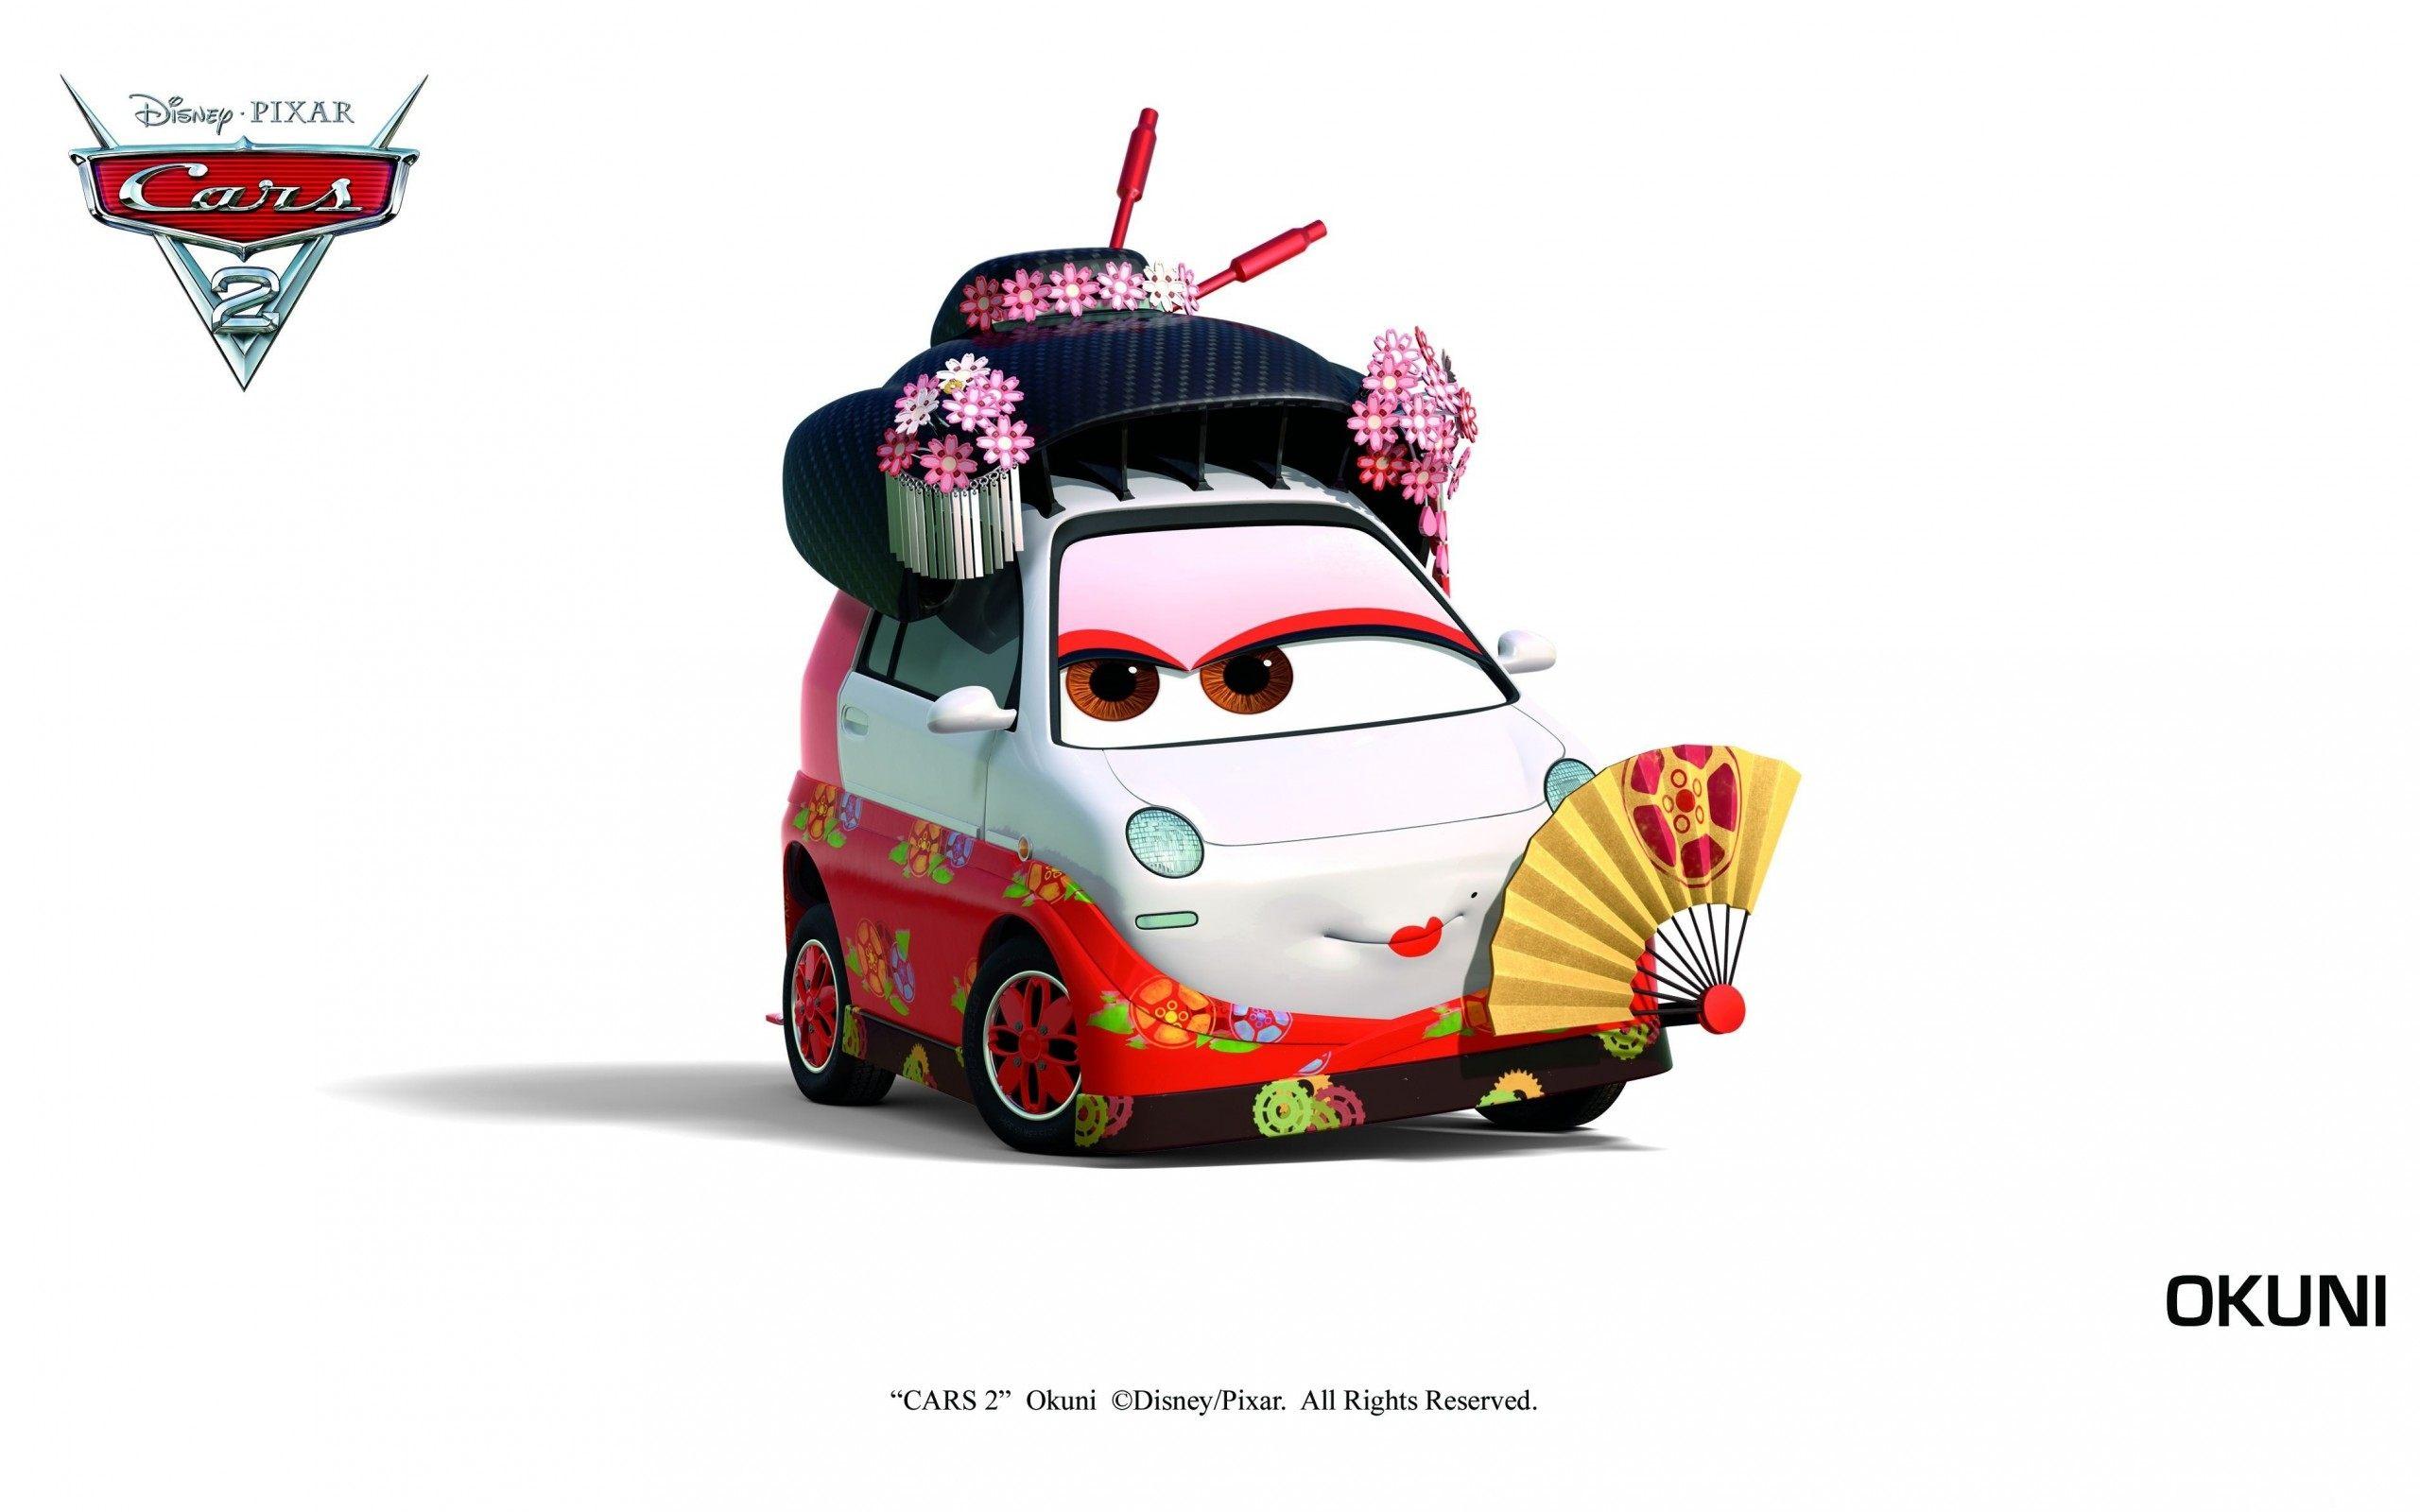 Cars The Movie Wallpaper Sf Wallpaper